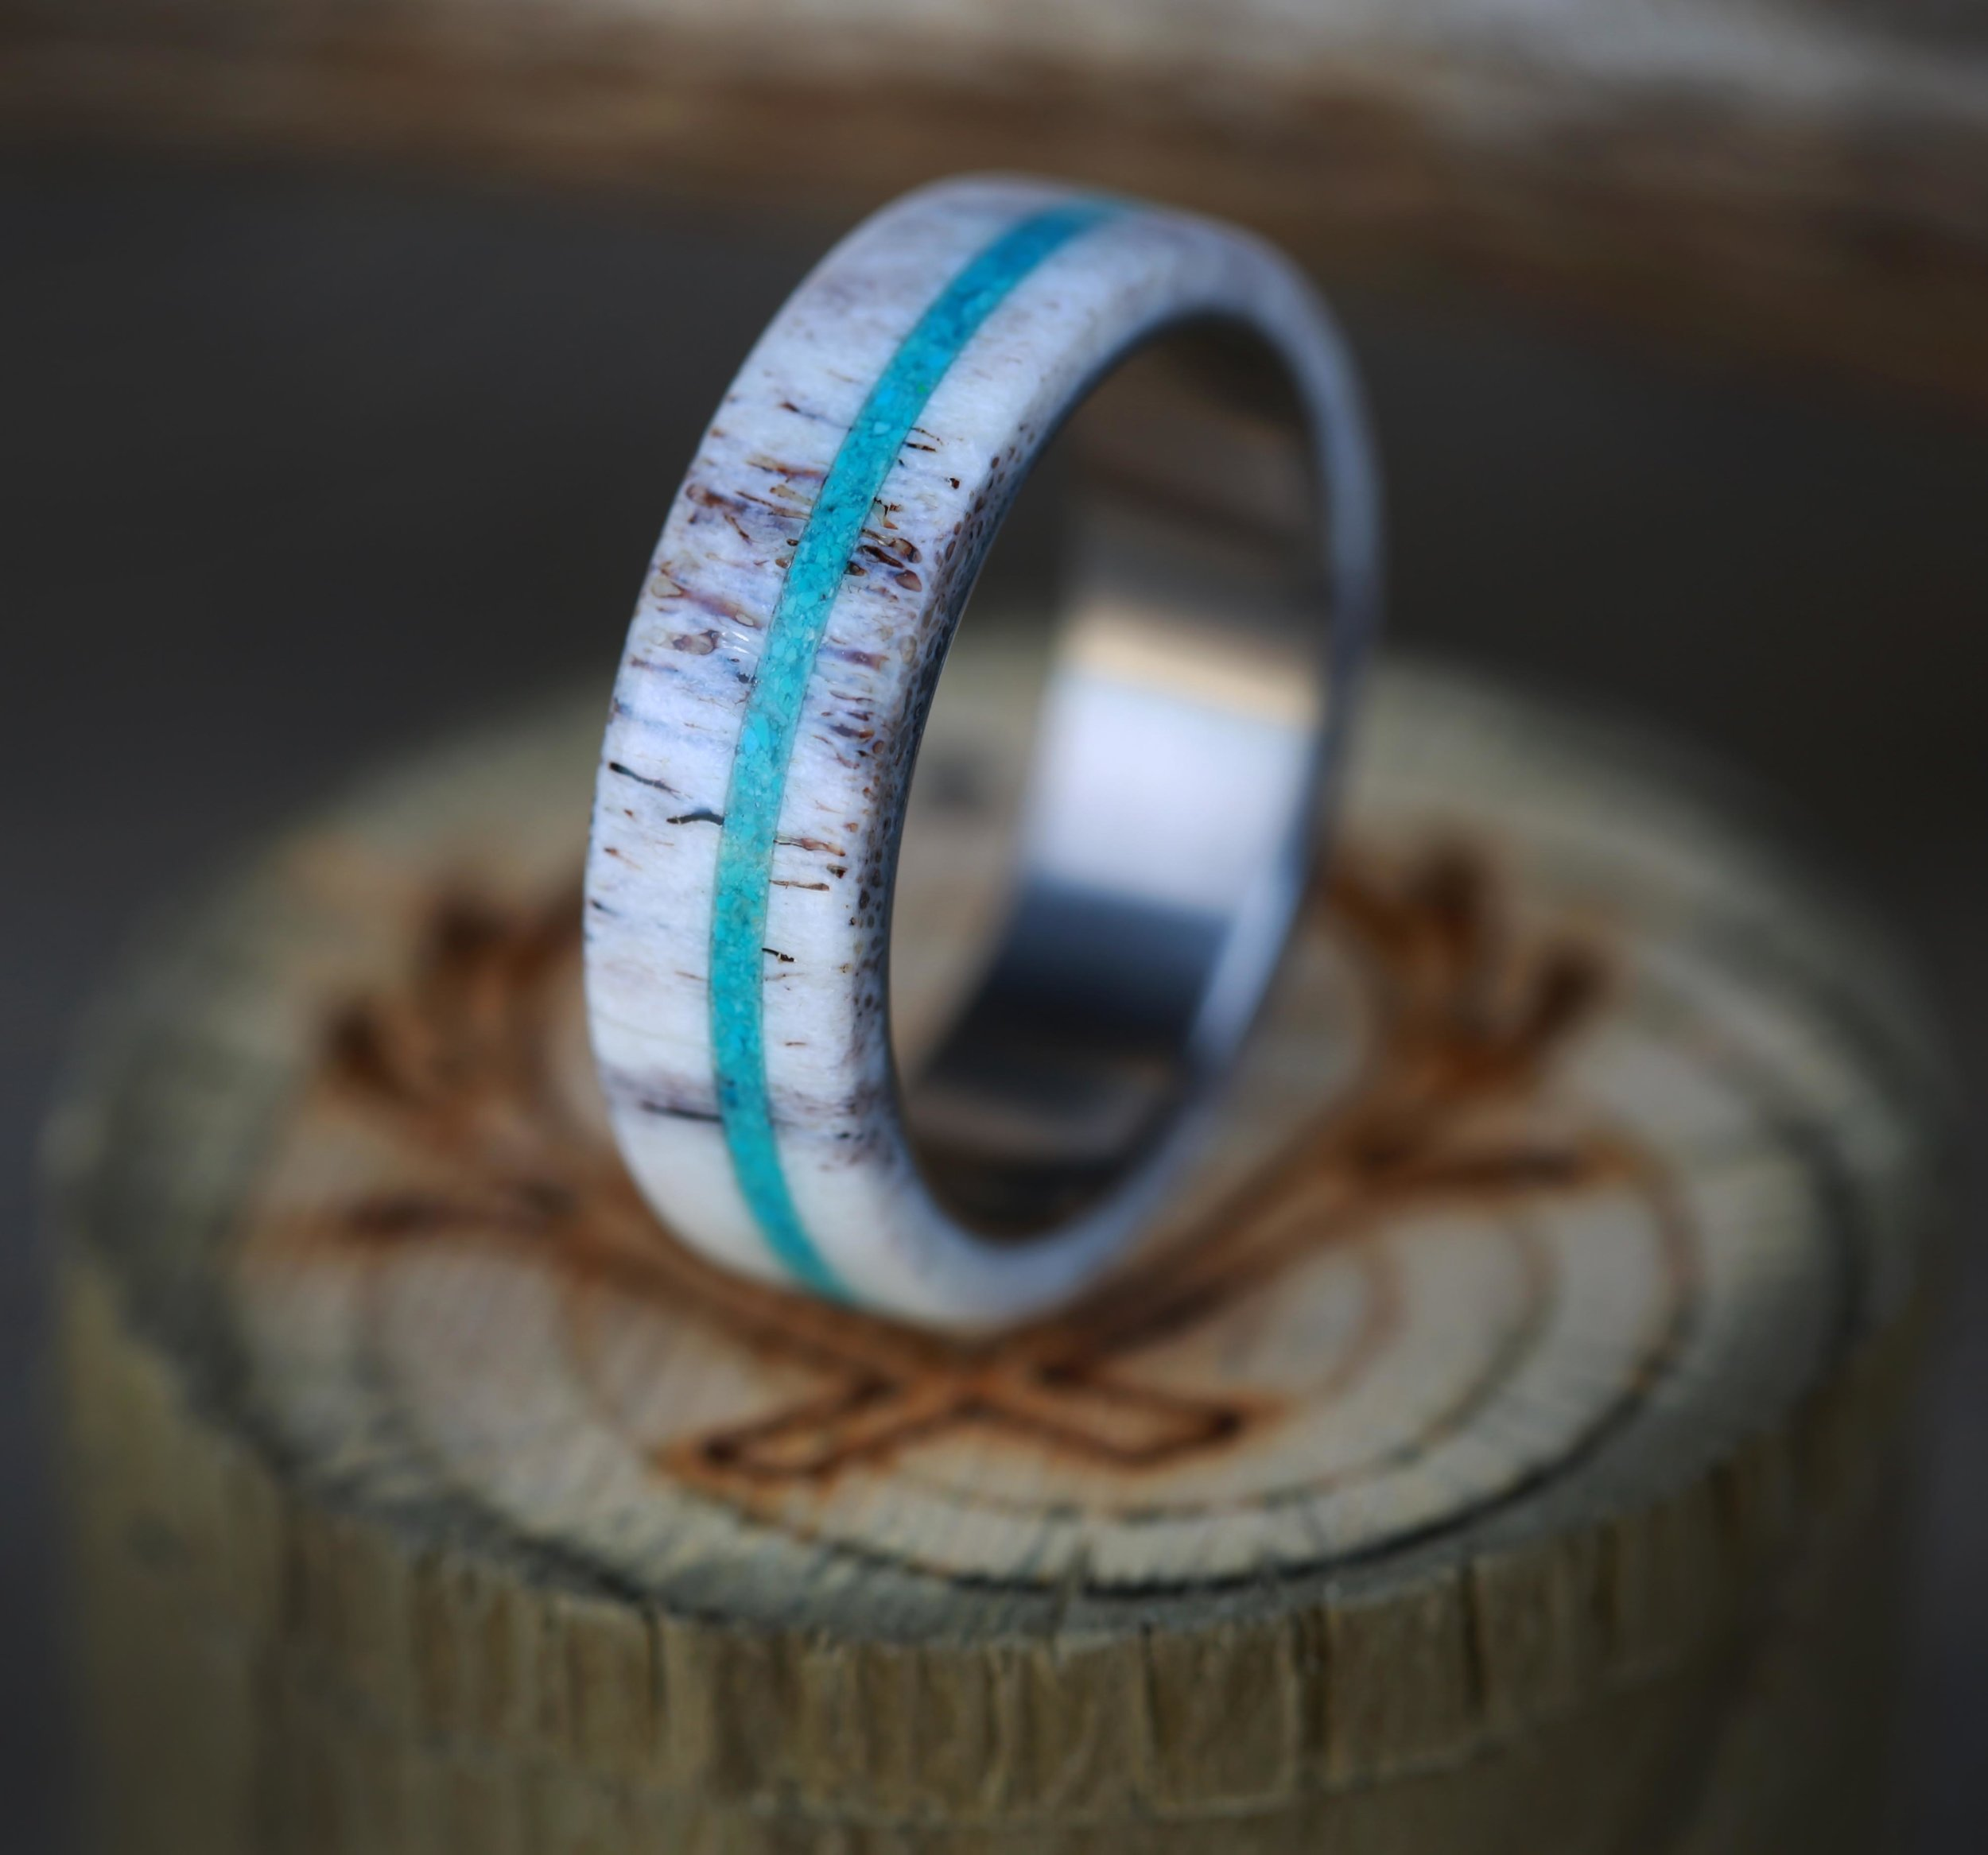 antler wedding ring antler wedding ring Antler wedding ring Antler Wedding Ring 18